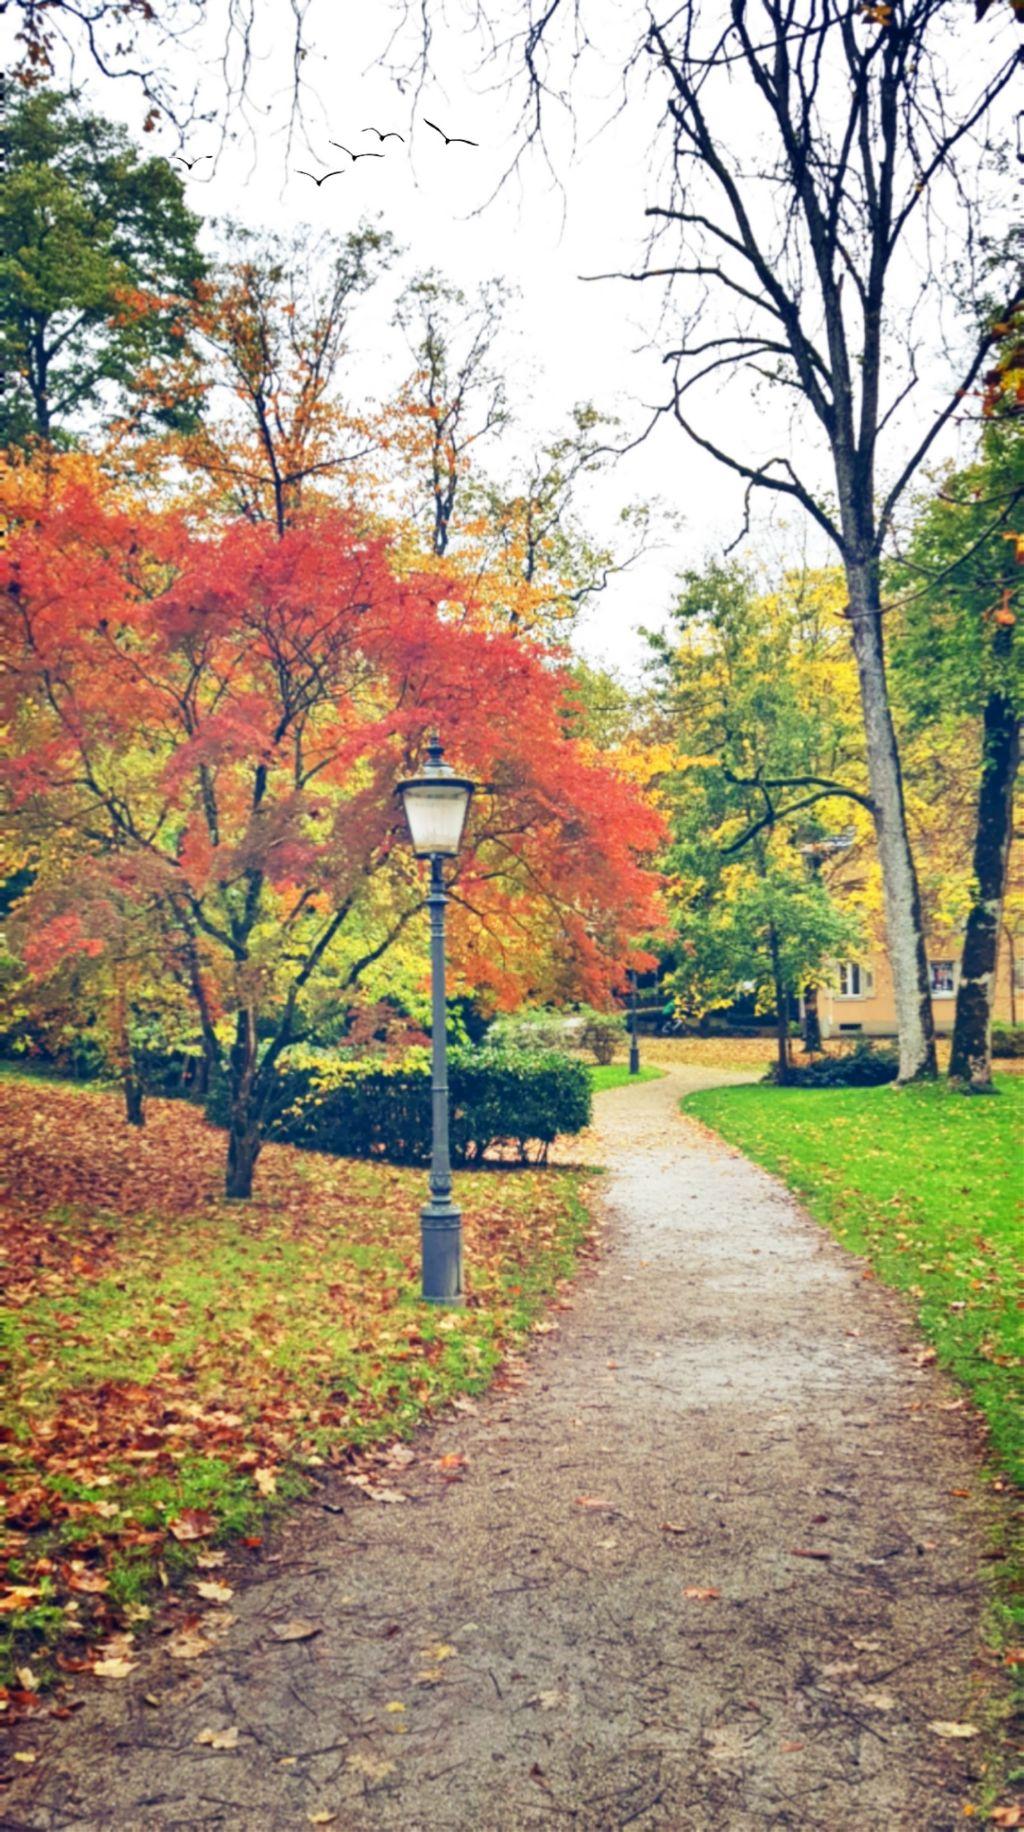 Morning walk - #freetoedit #autumn #fall #leaves #colorful #nature #outdoors #morningwalk #edit #myedit #happiness #fallcolors